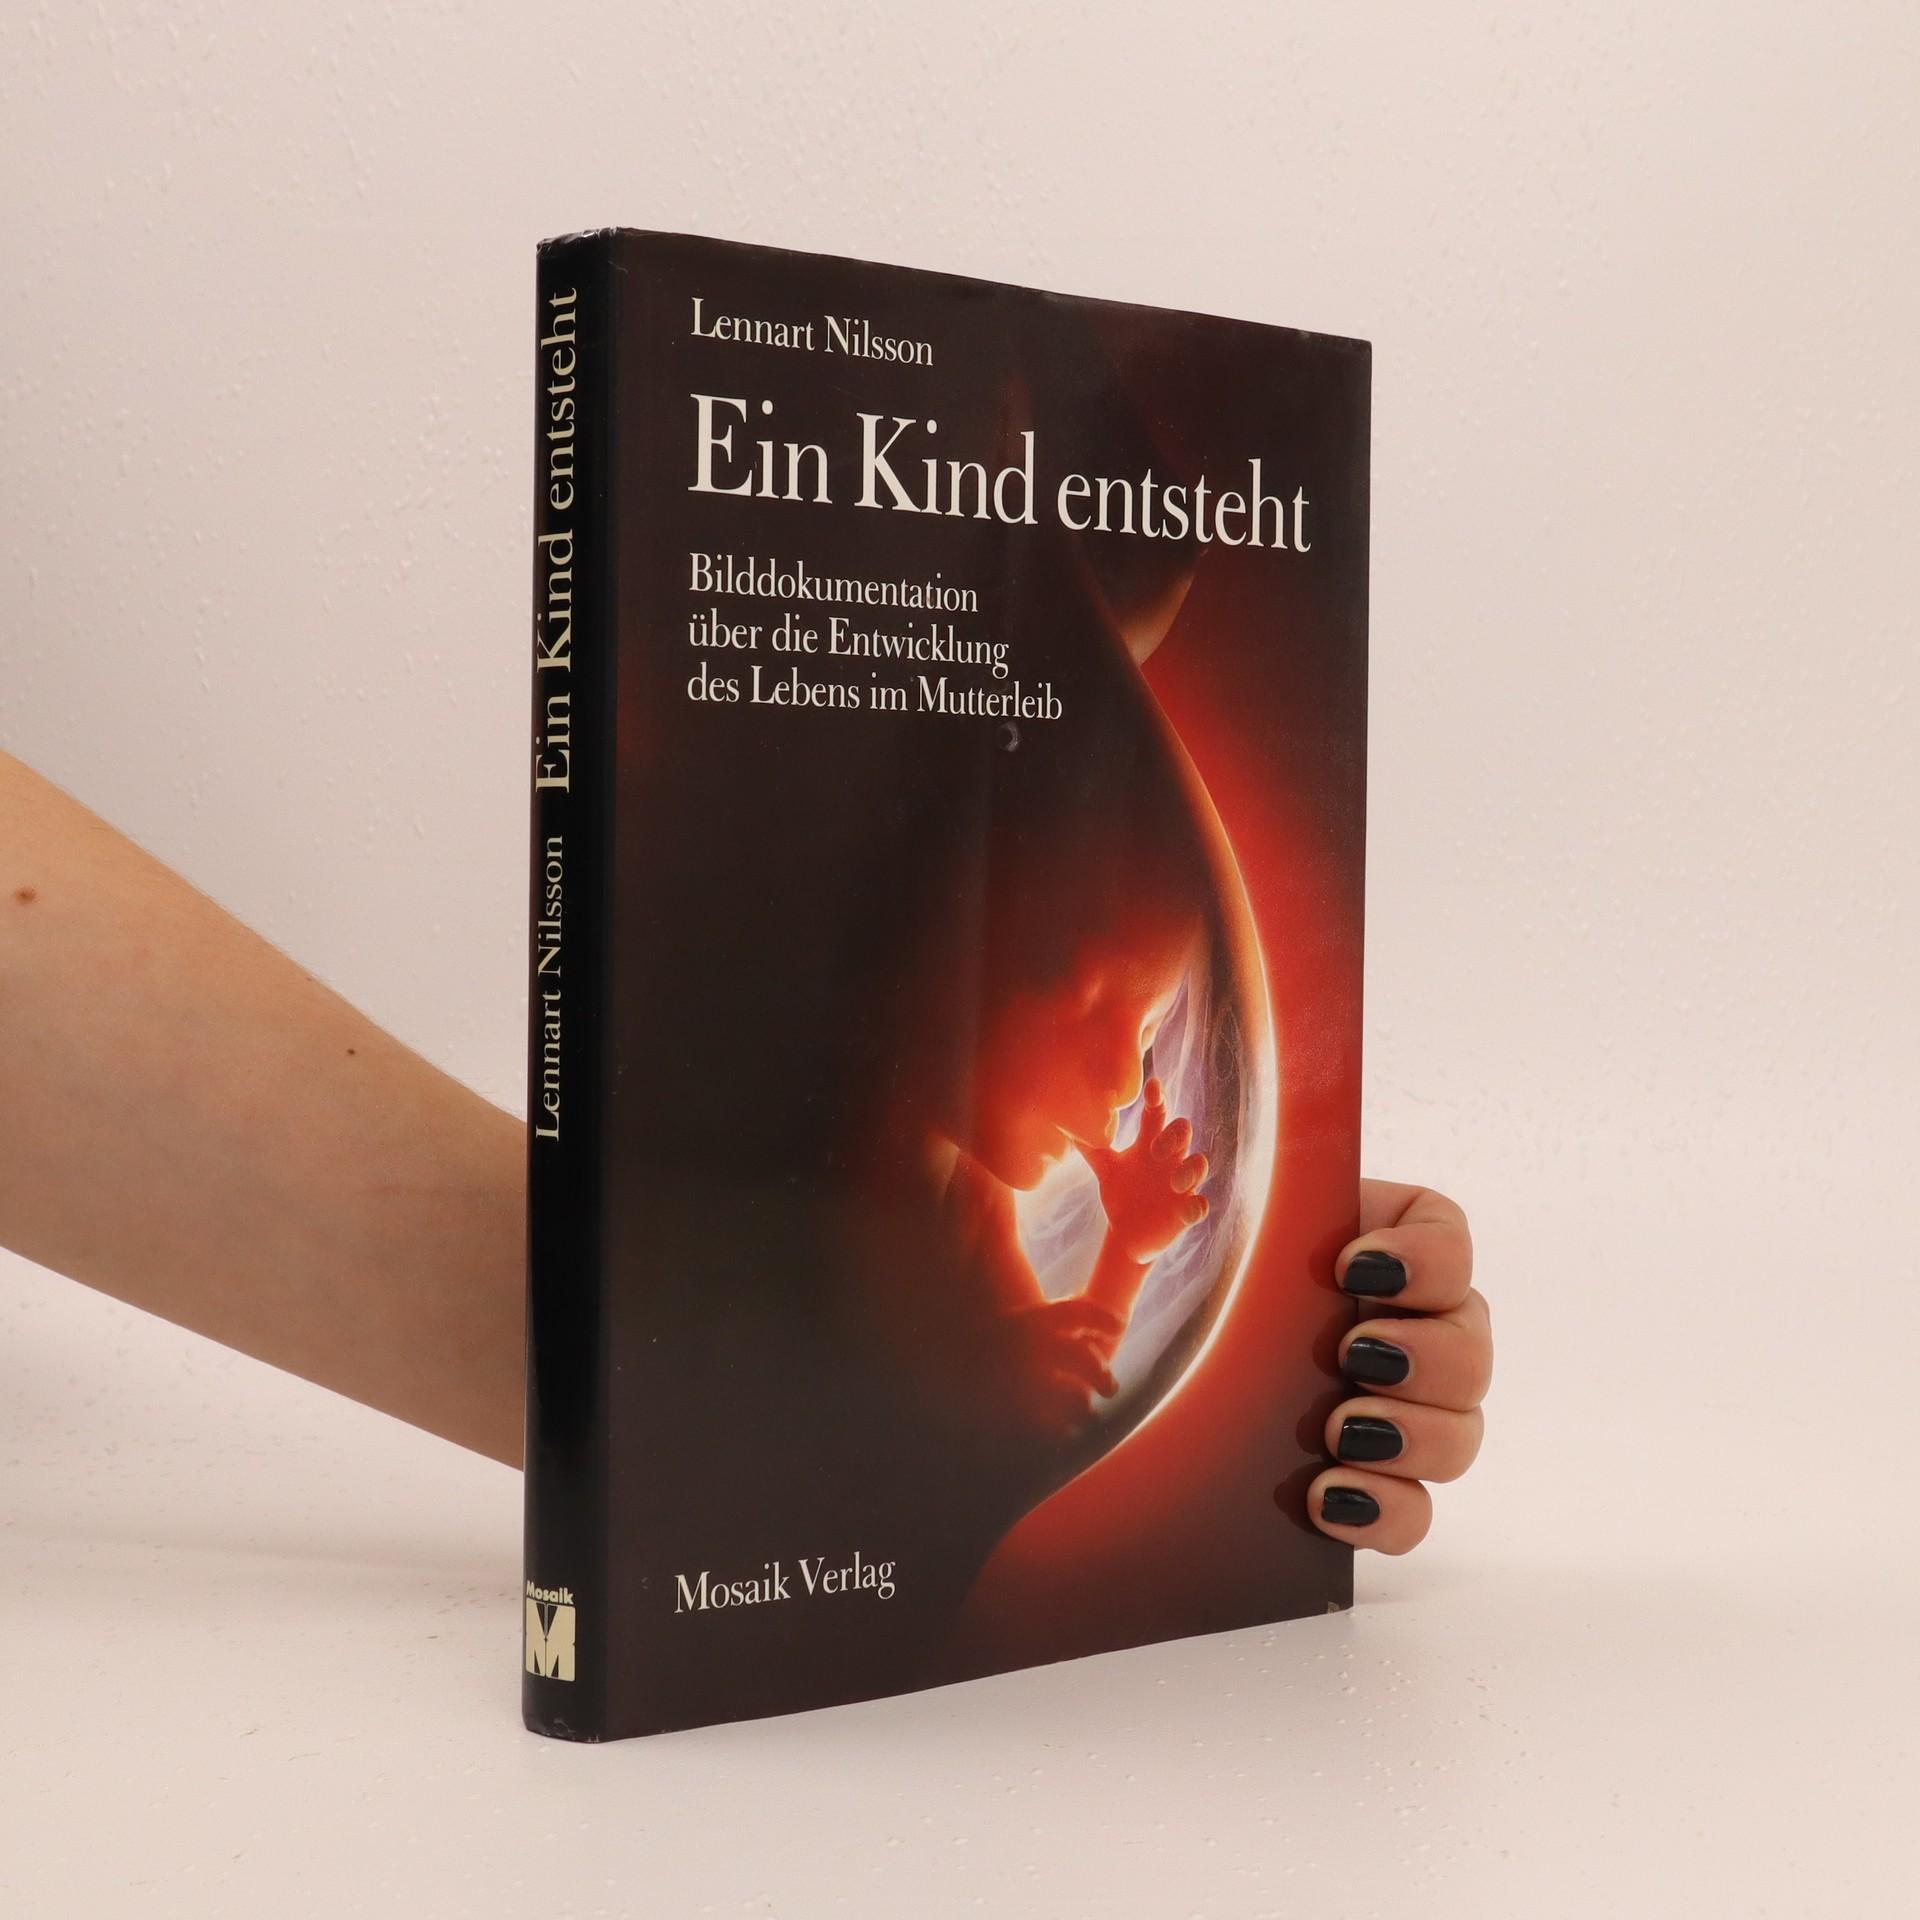 antikvární kniha Ein Kind entsteht, 1994